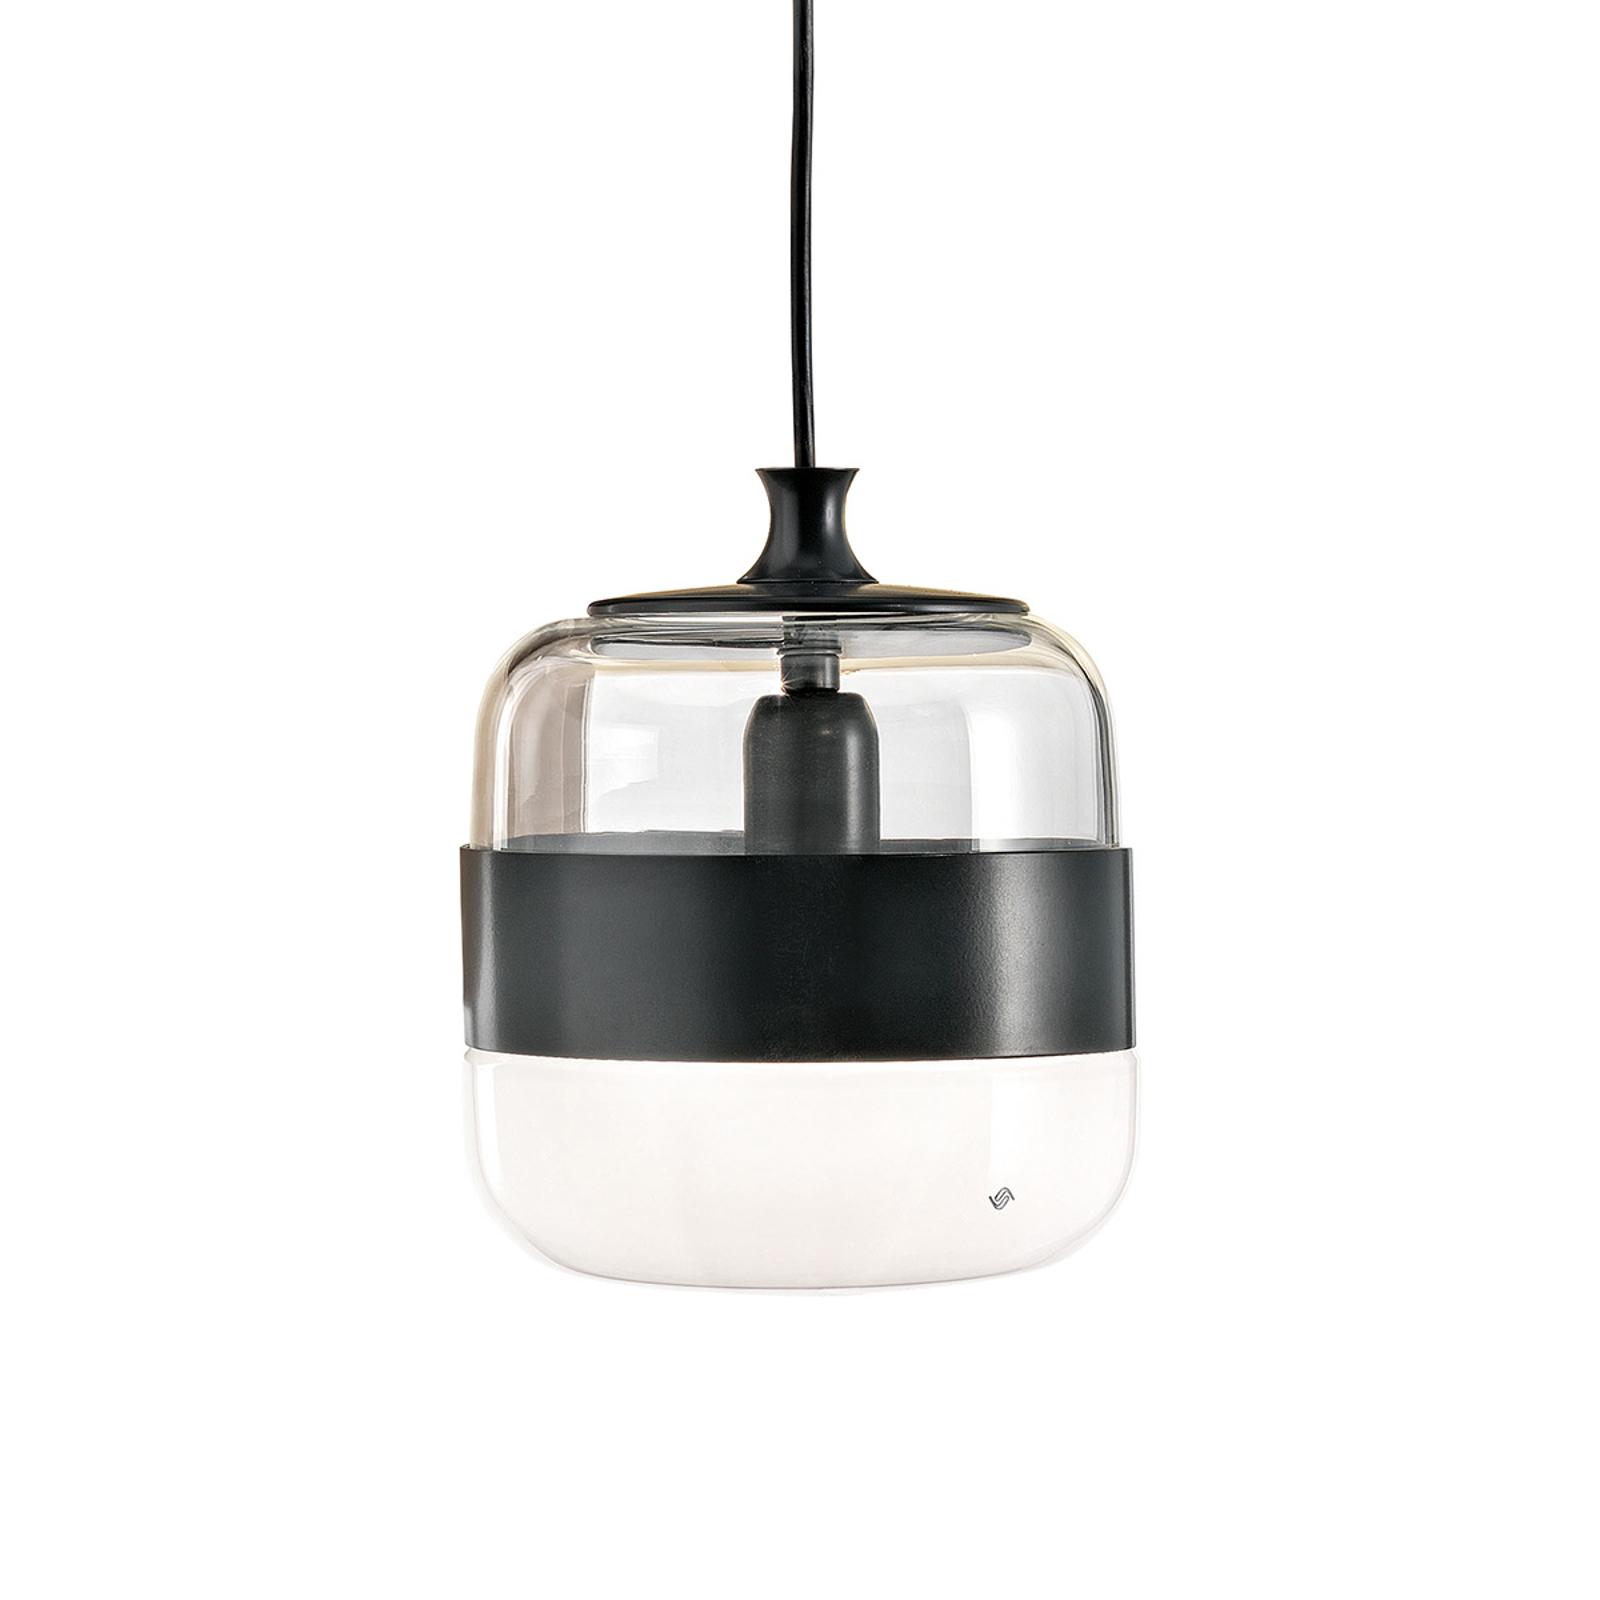 Lampa wisząca Futura ze szkła Murano, 20 cm